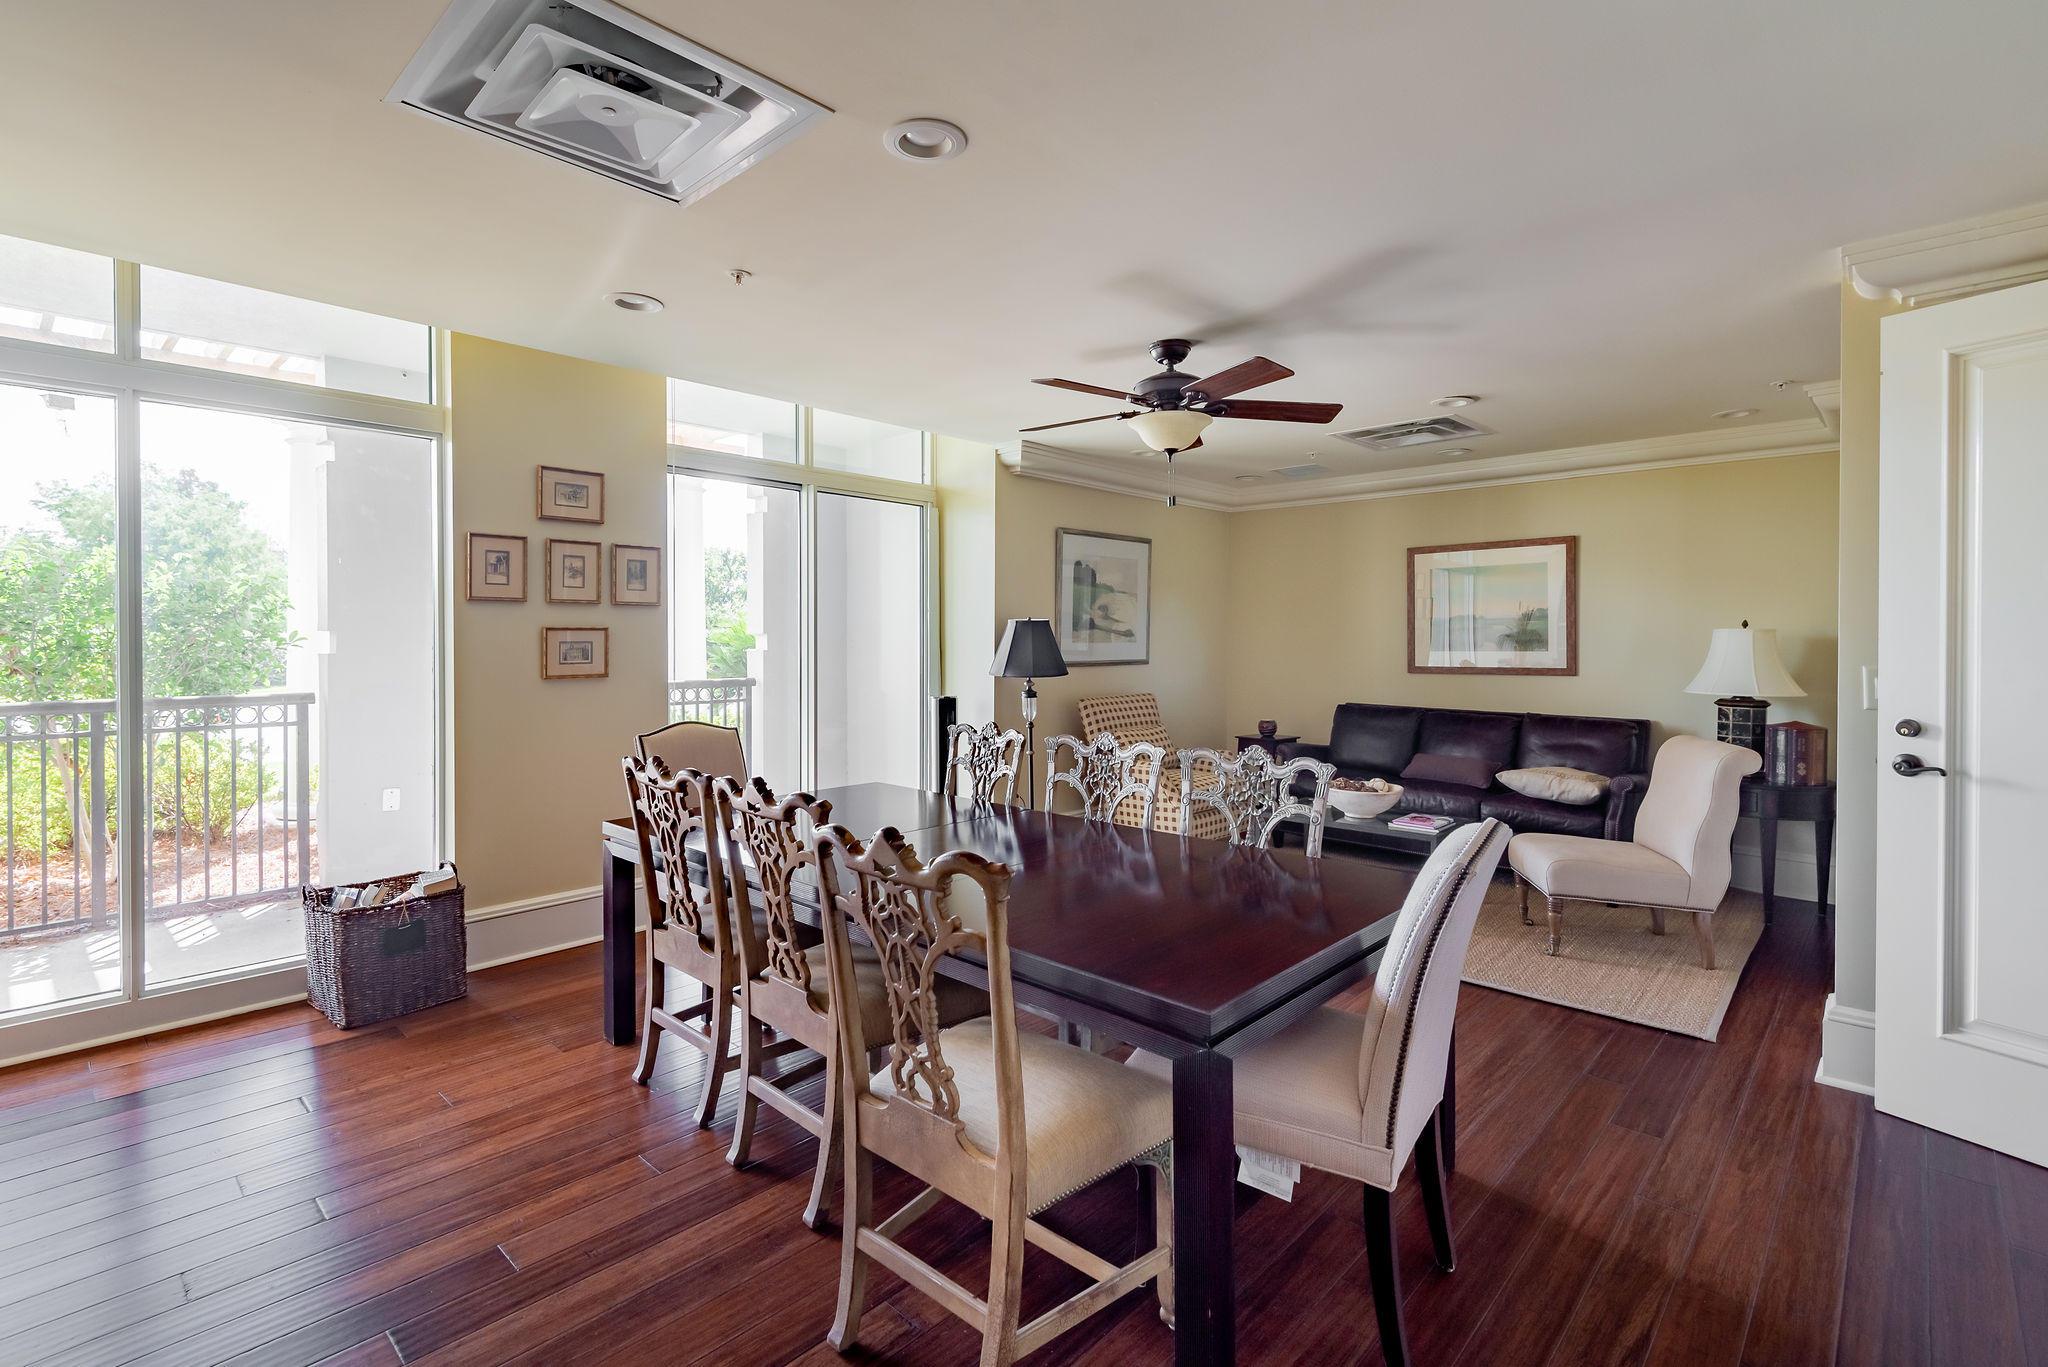 Renaissance On Chas Harbor Homes For Sale - 134 Plaza, Mount Pleasant, SC - 17